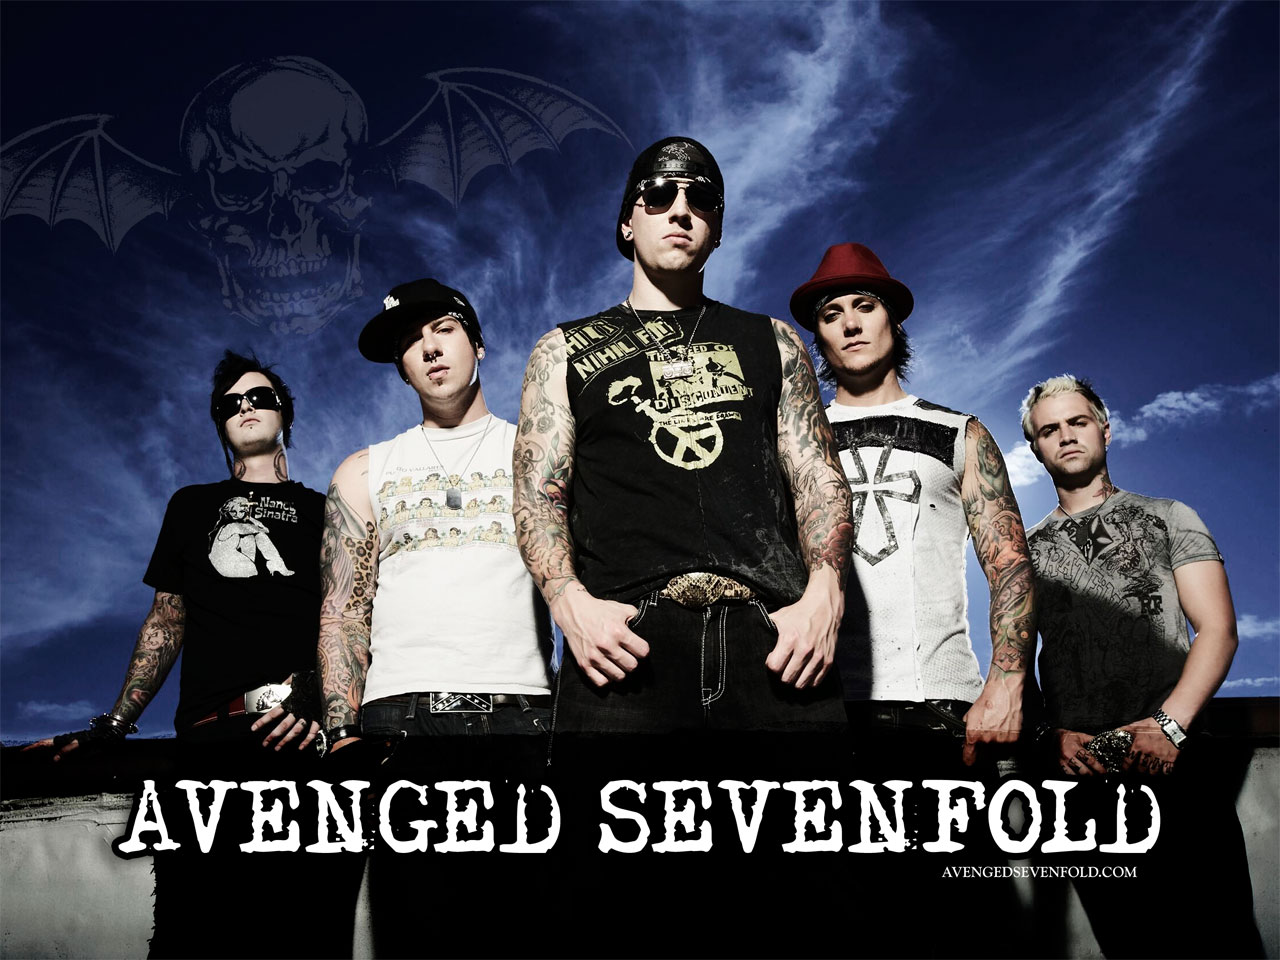 Top 10 avenged sevenfold songs youtube.